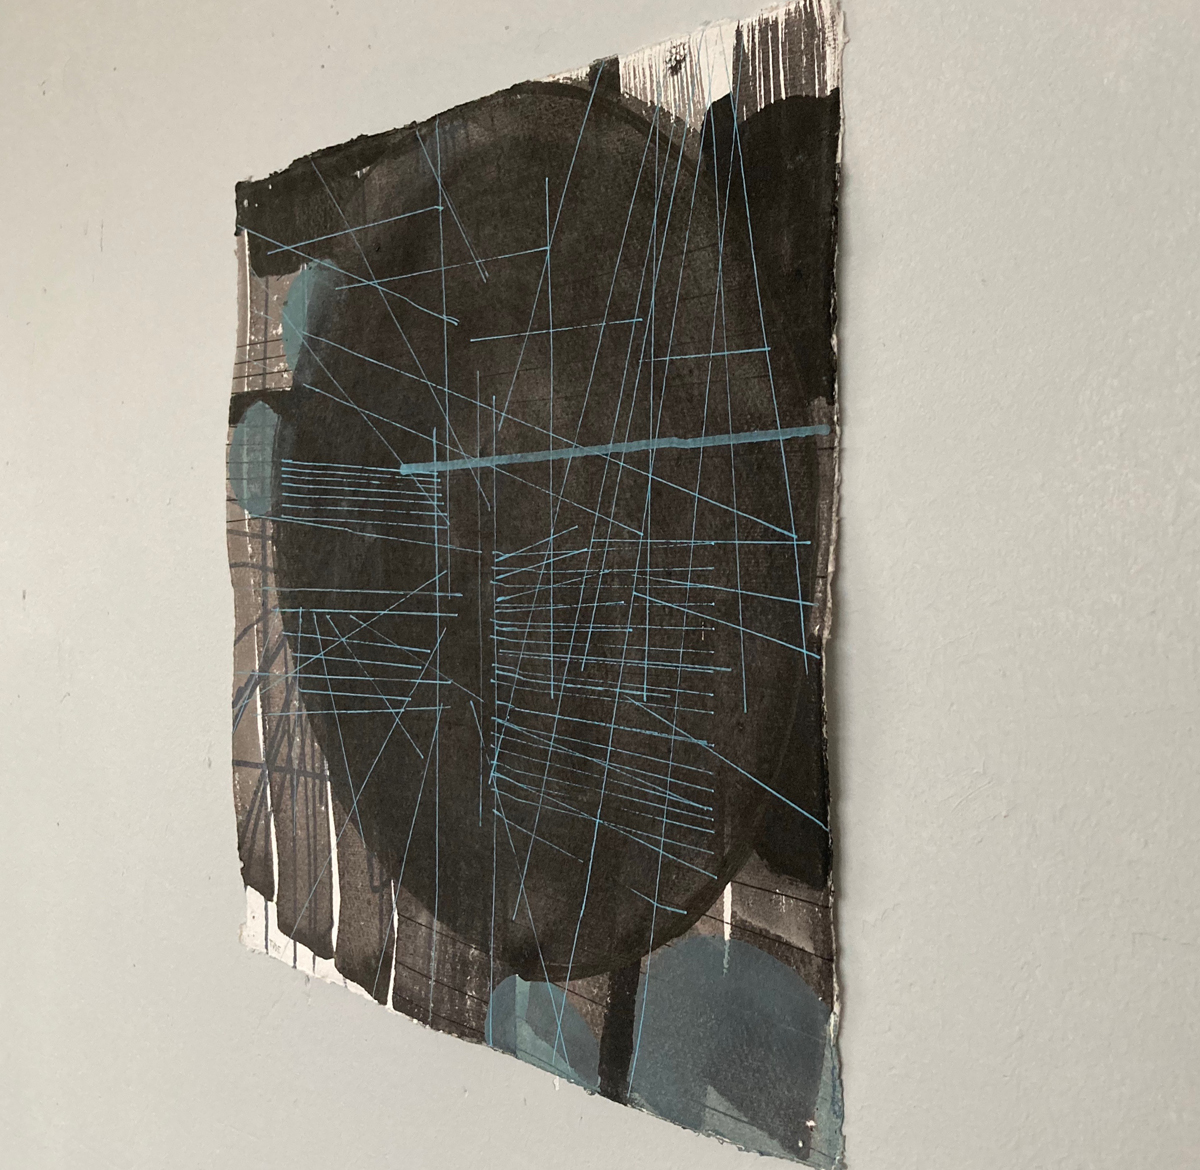 8.TVDE,XR series3,acrylic on paper, 30x30cm-Nua-Collective